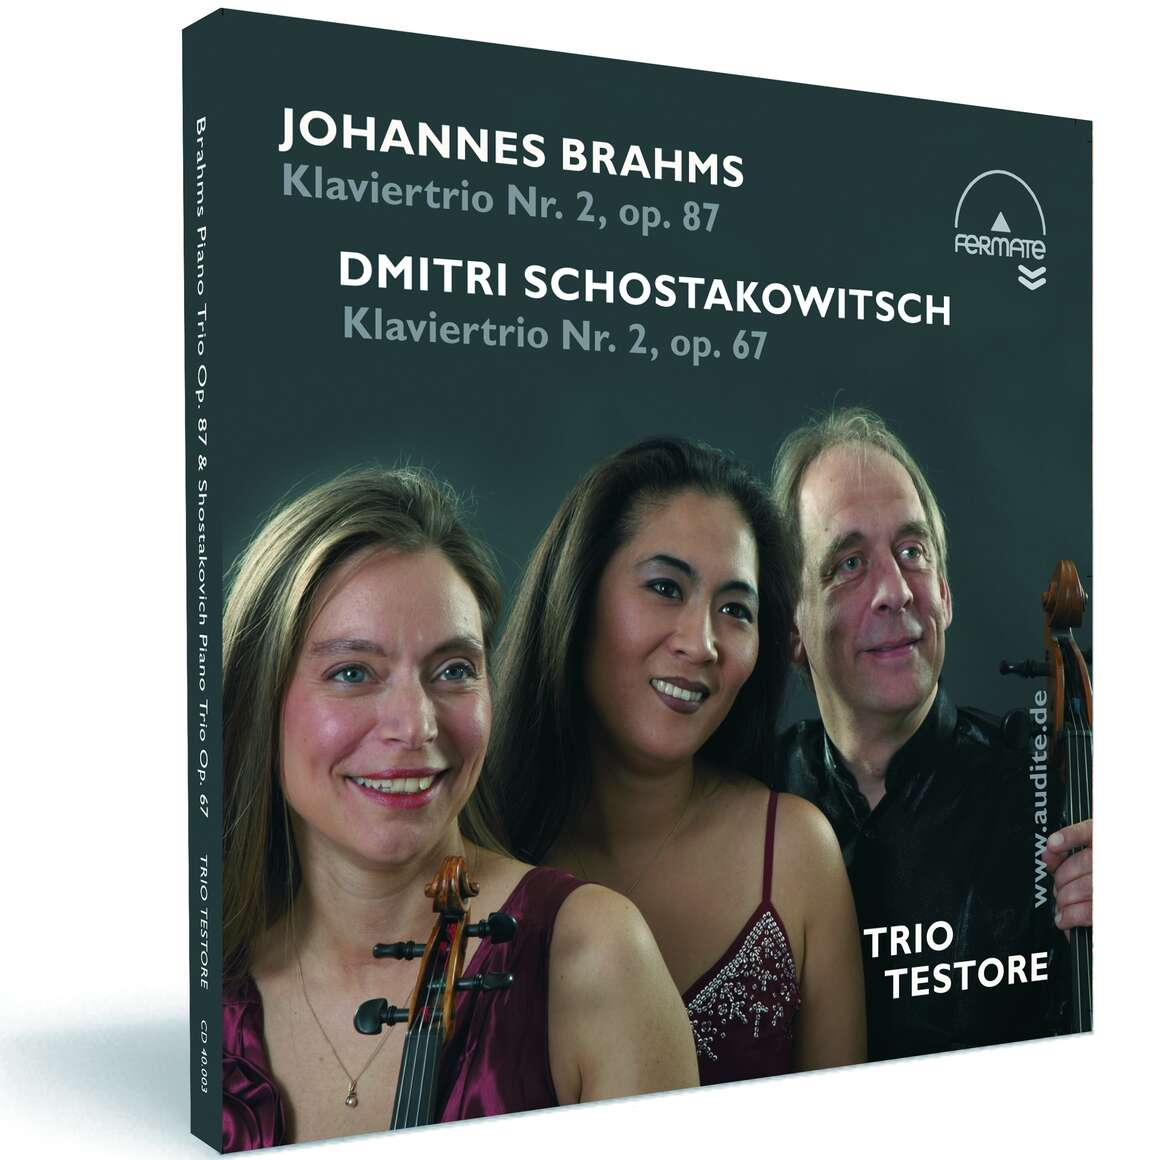 Piano Trios by Brahms (Op. 87) & Schostakowitsch (Op. 67)